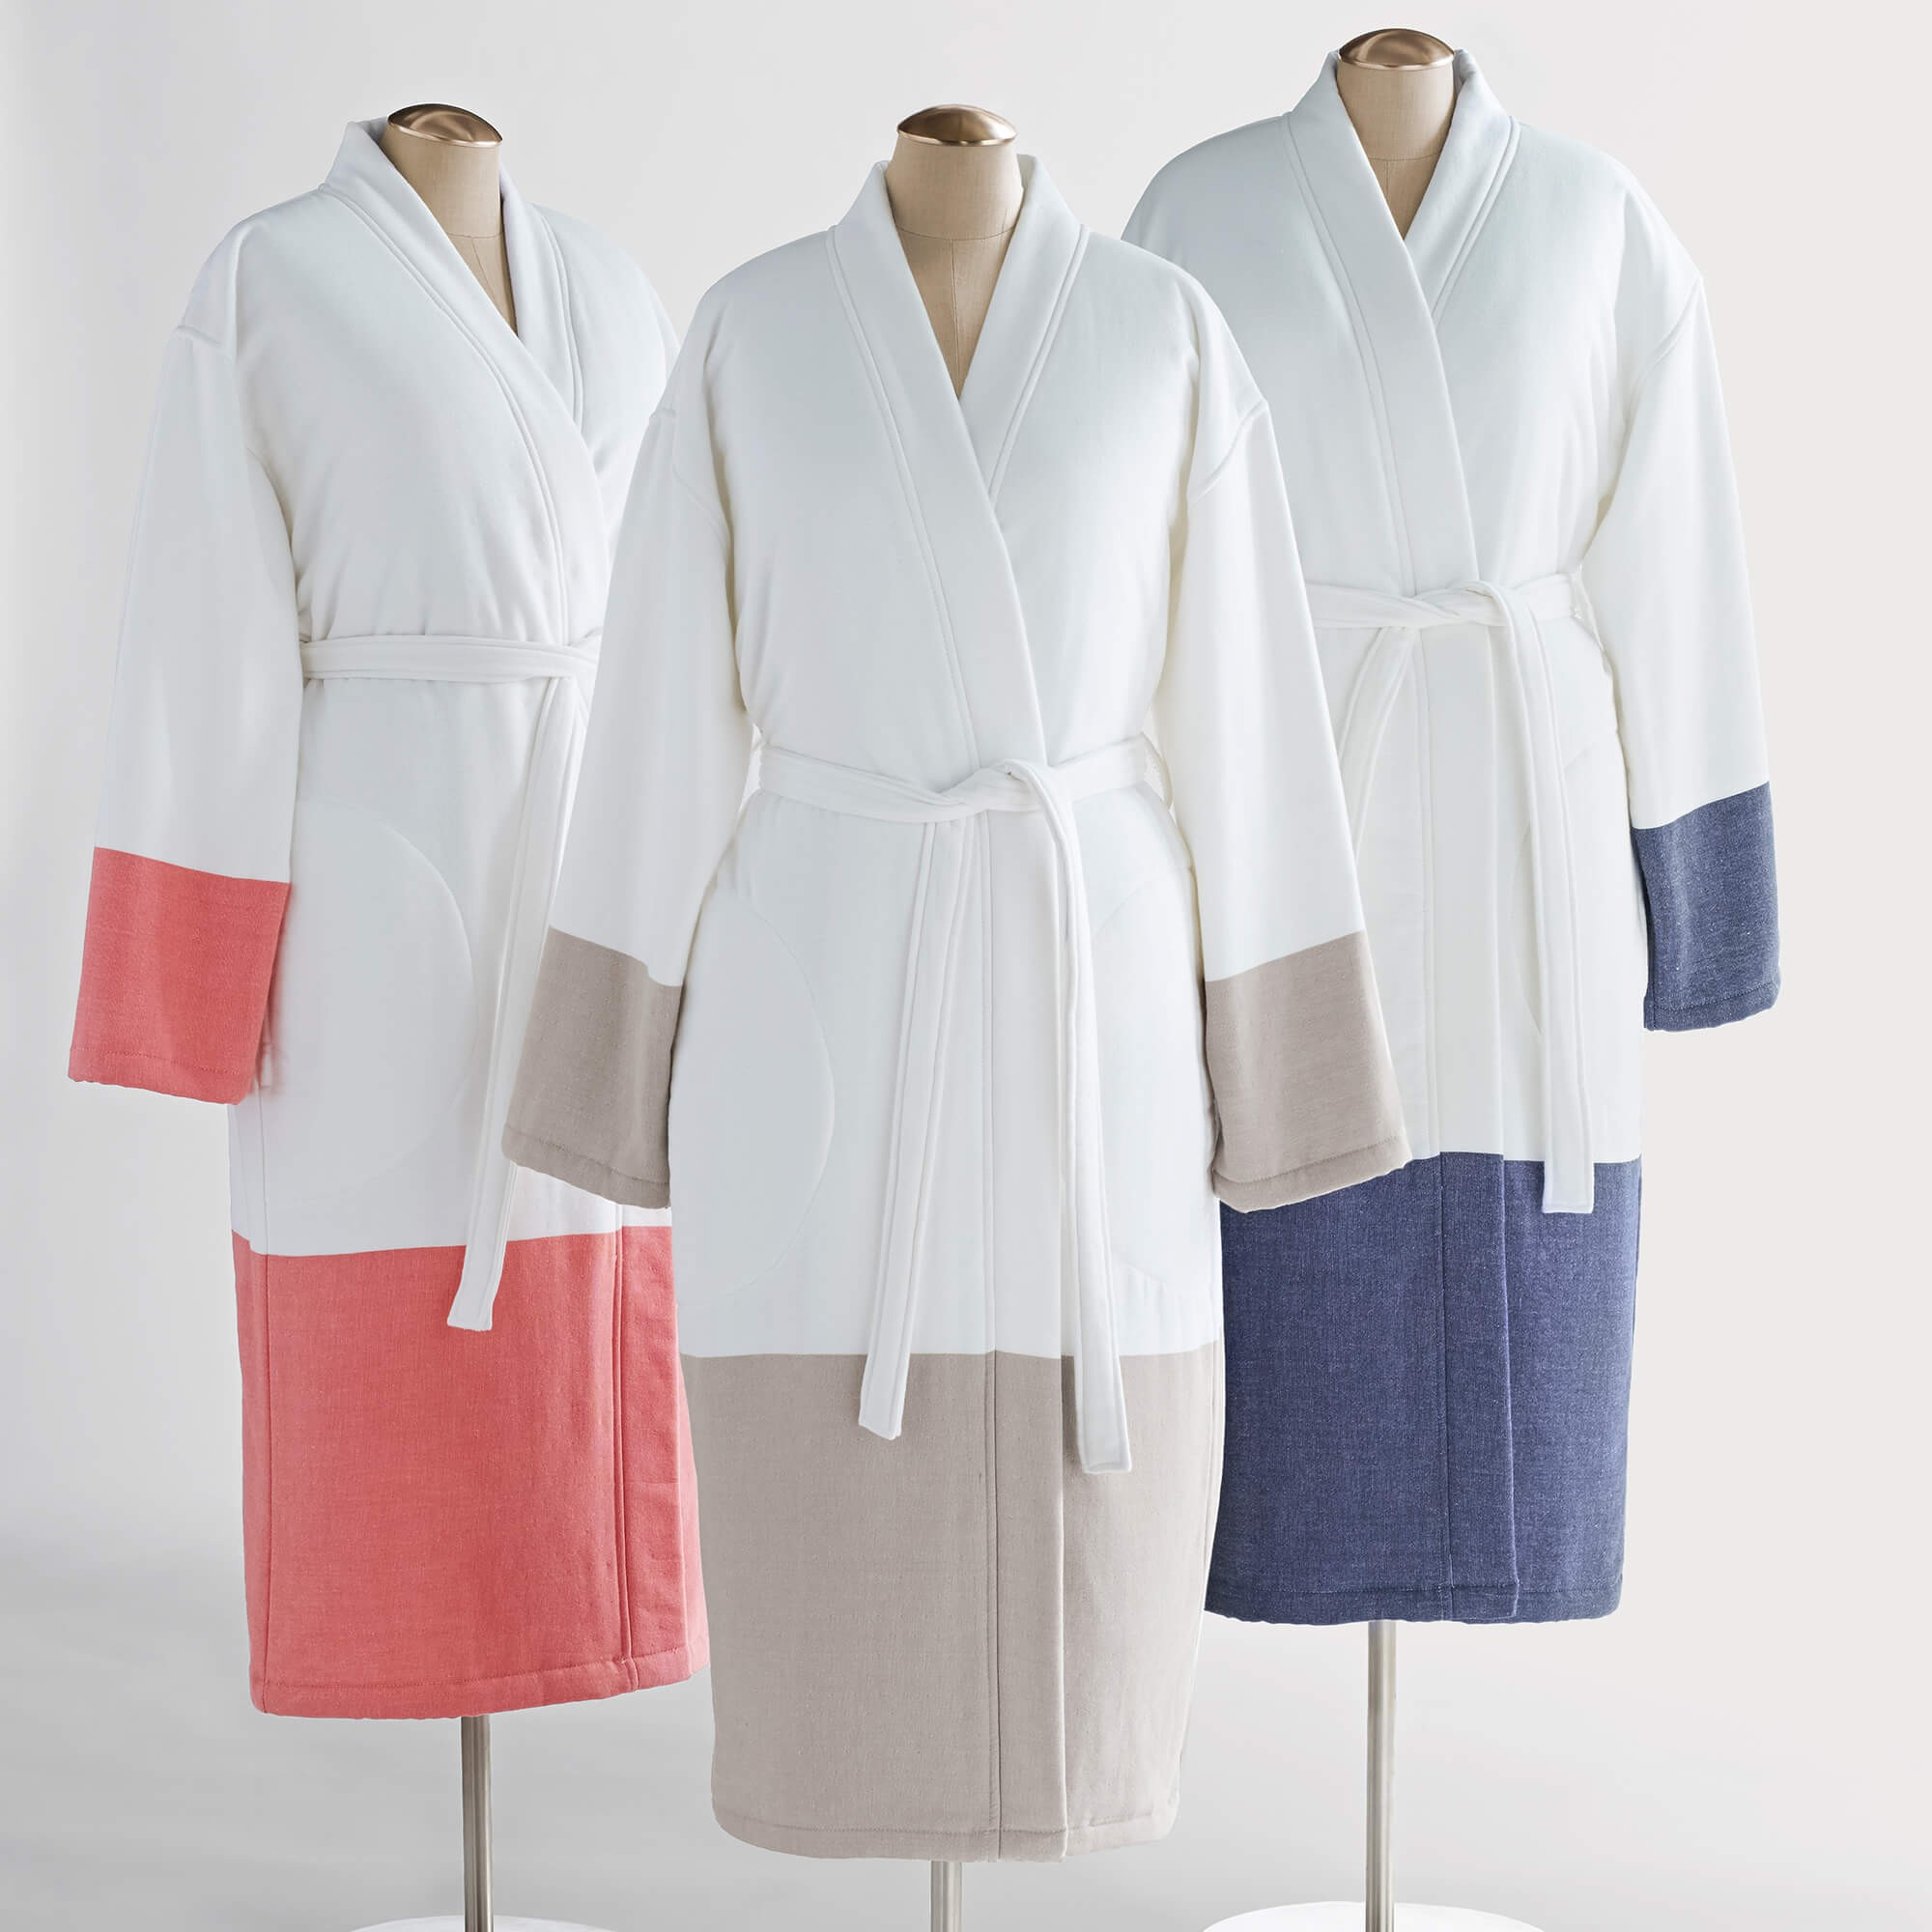 bridesmaids robes kassatex